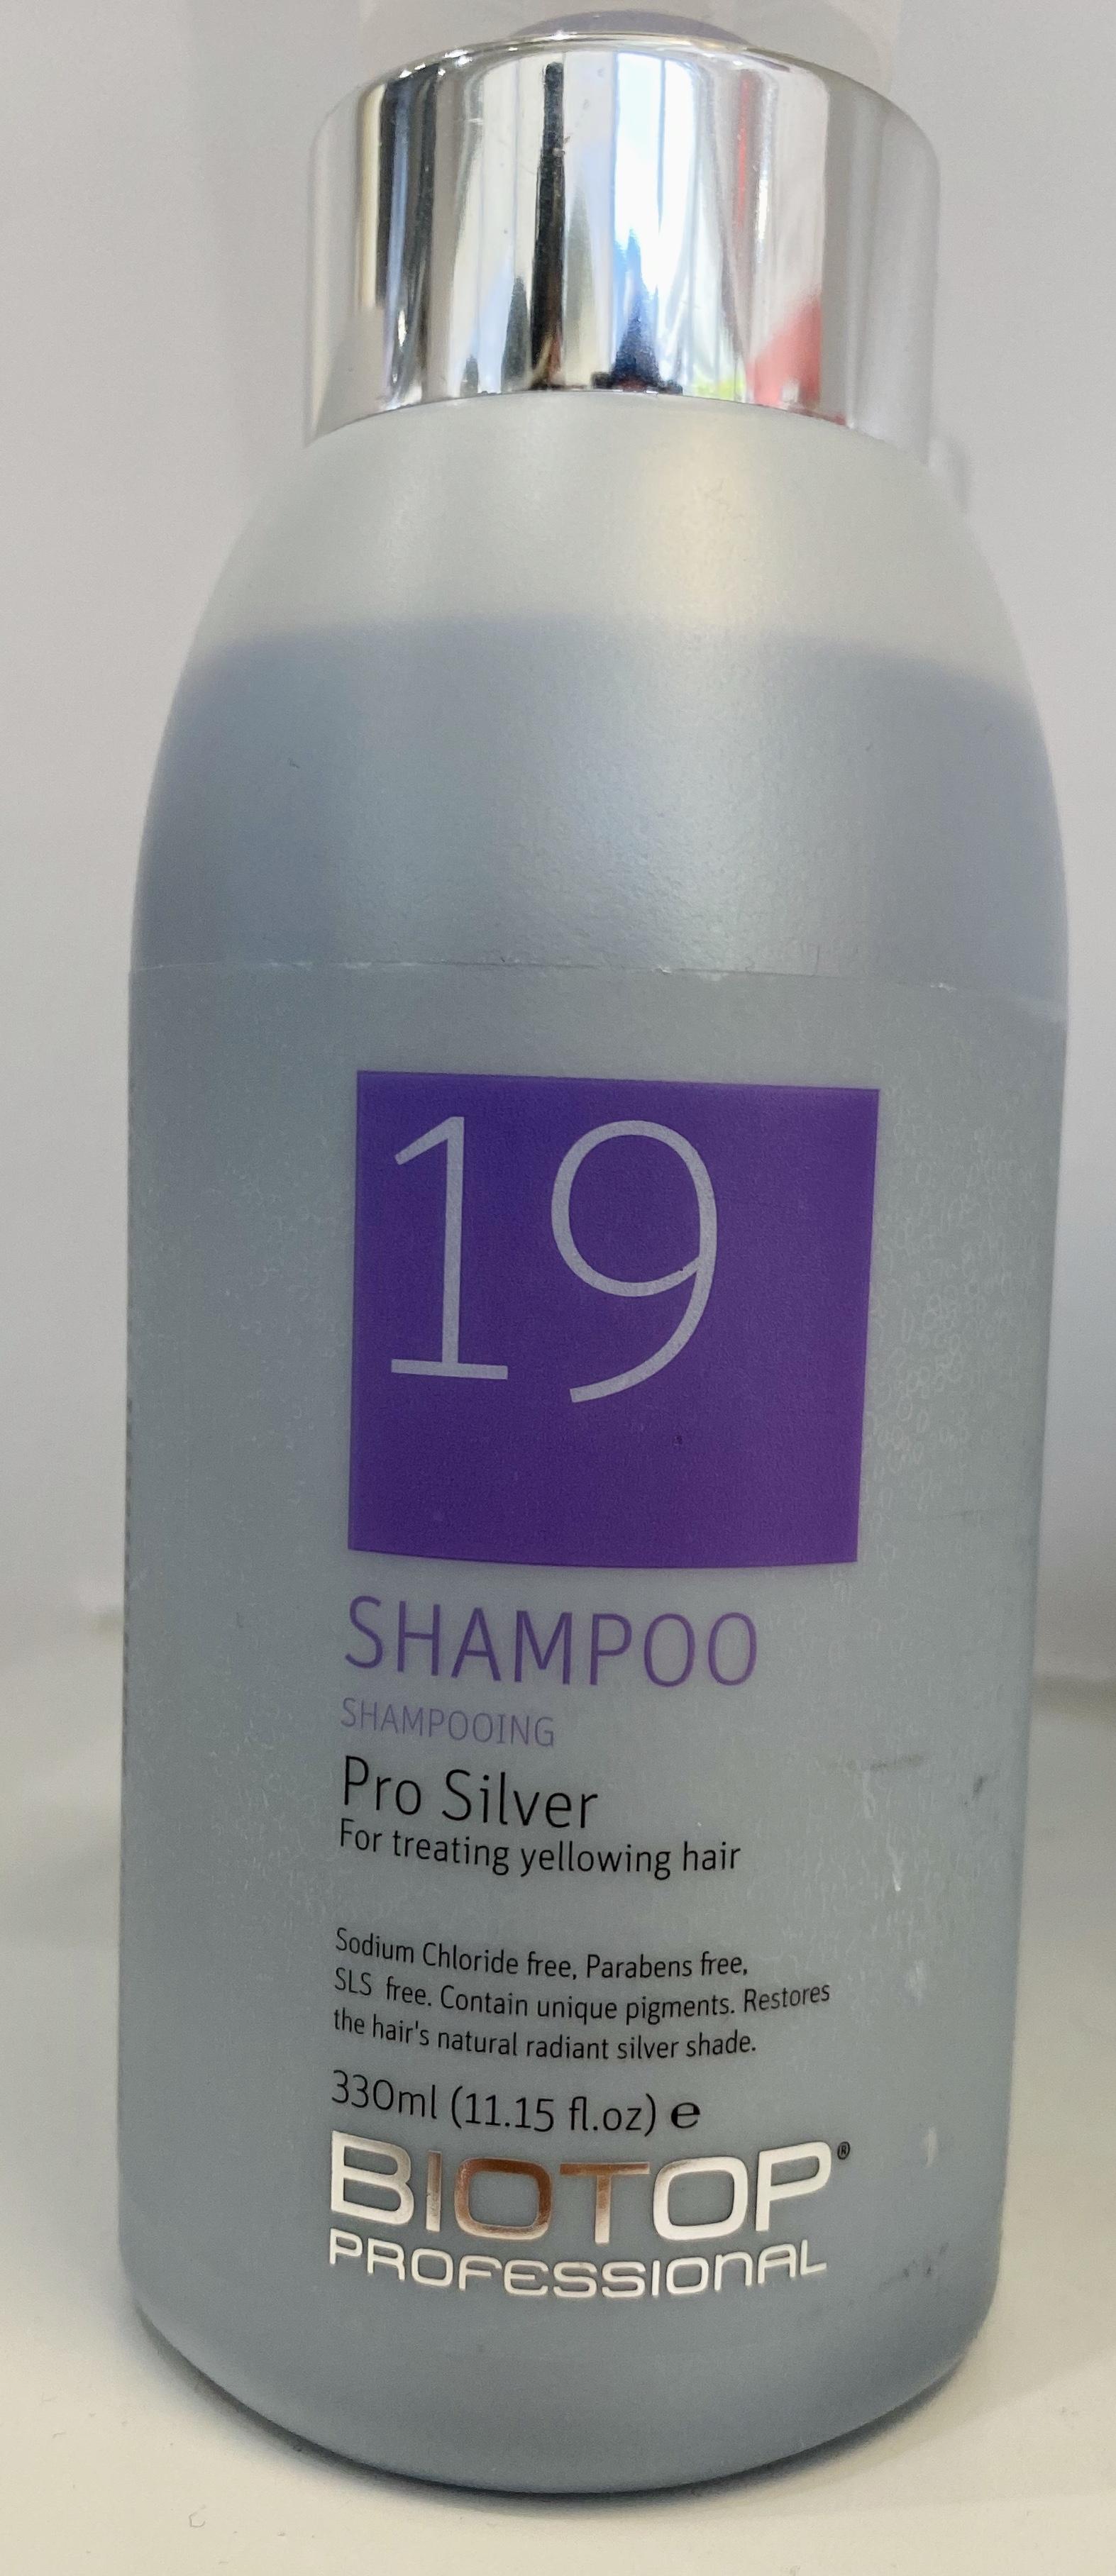 19 Pro Silver Shampoo